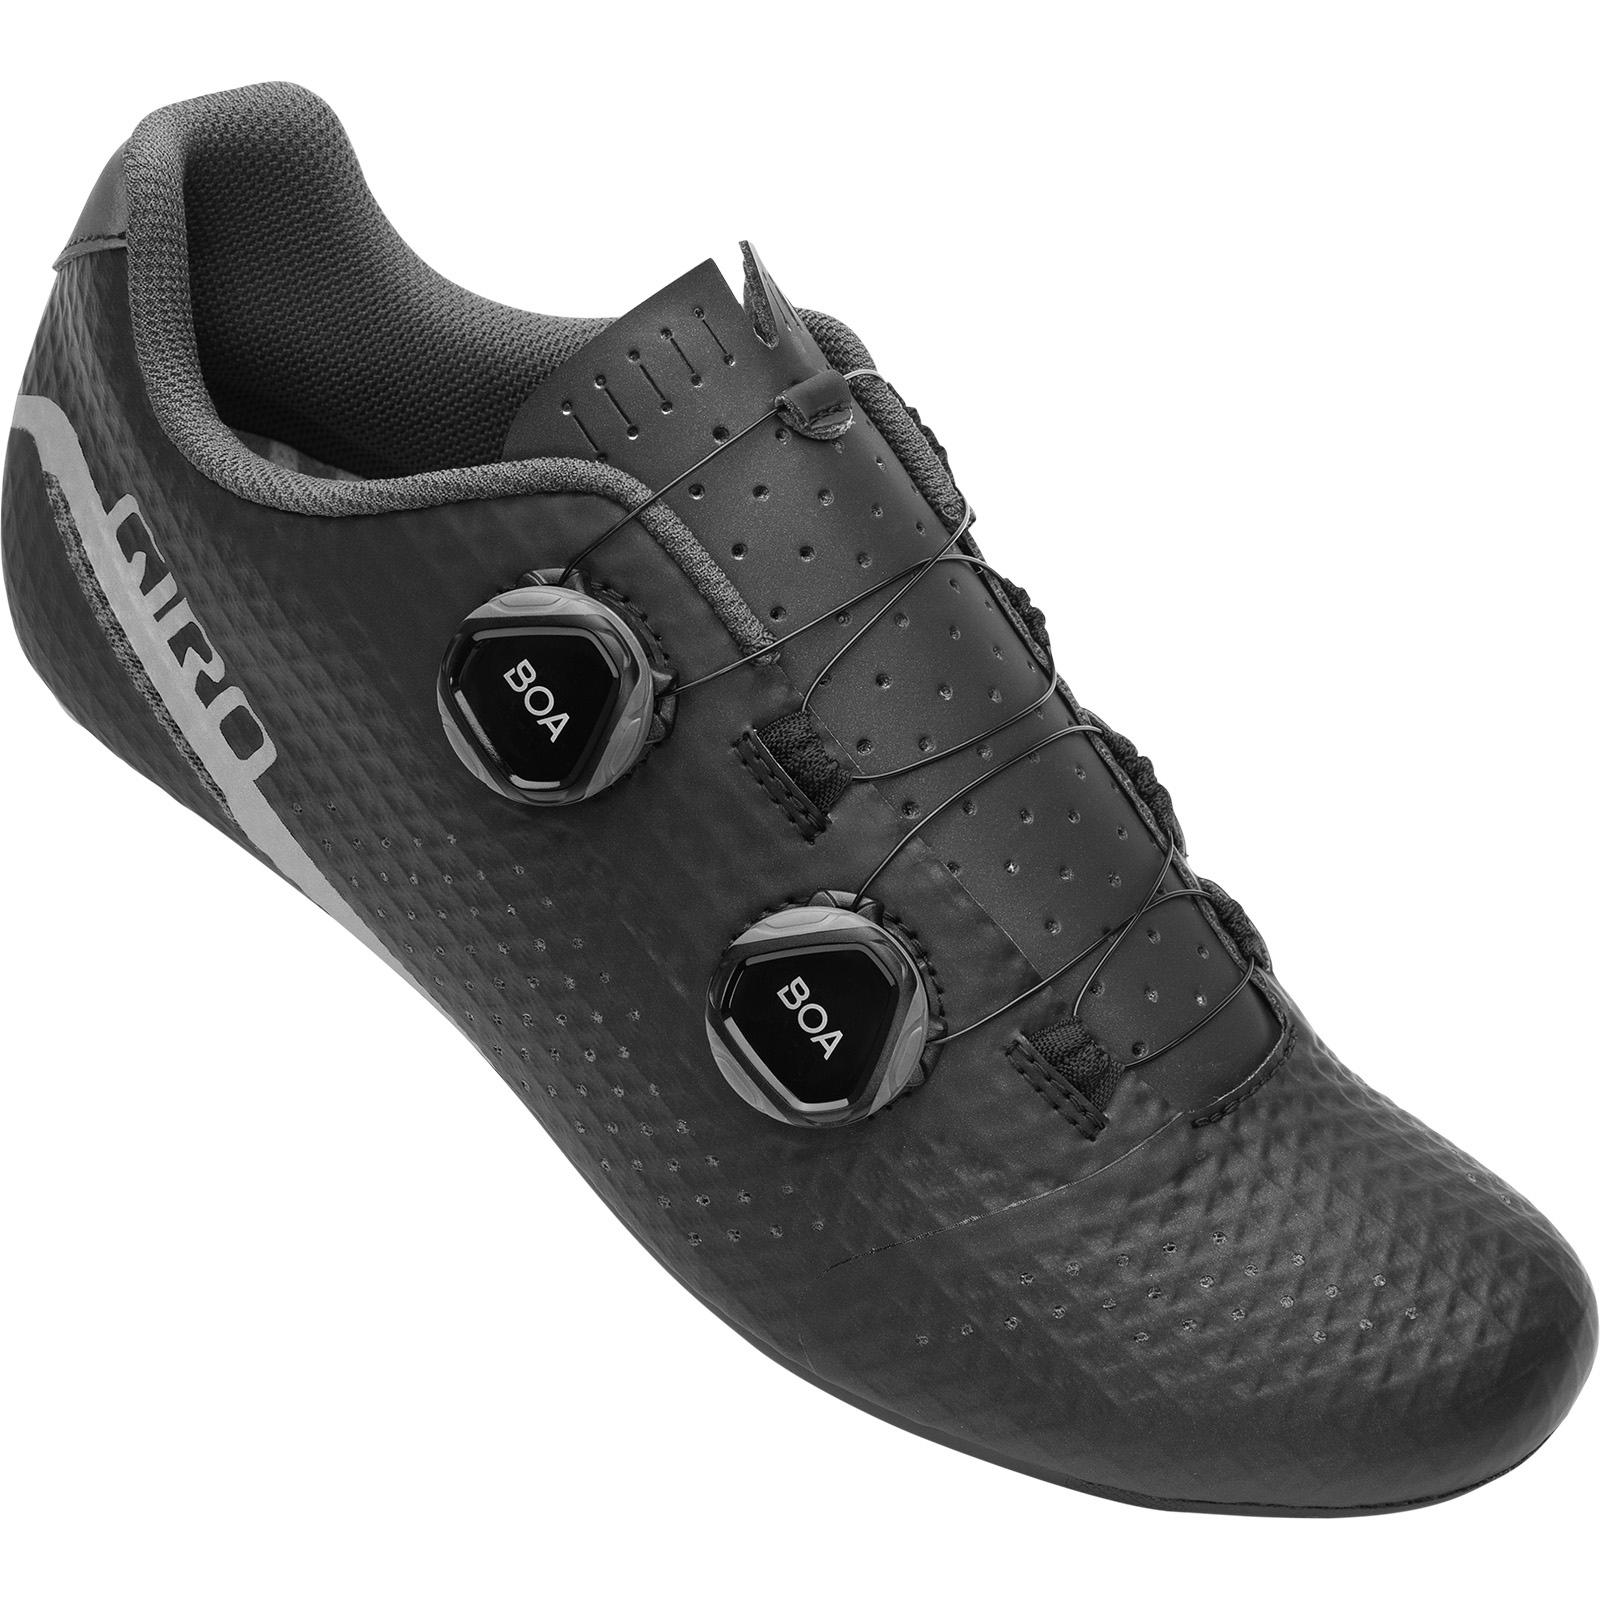 Picture of Giro Regime Women's Road Shoe - black